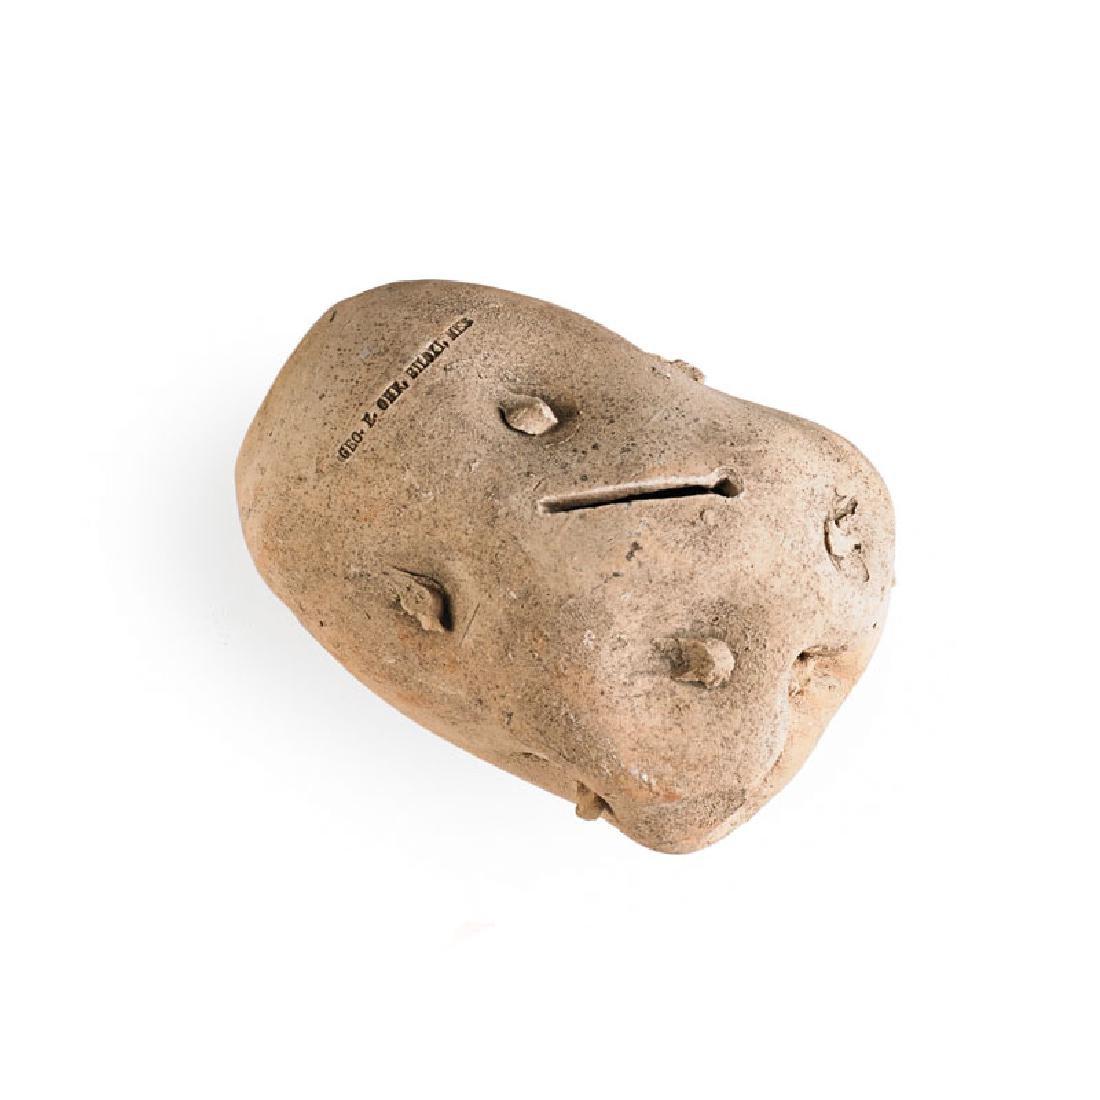 GEORGE OHR Potato novelty bank